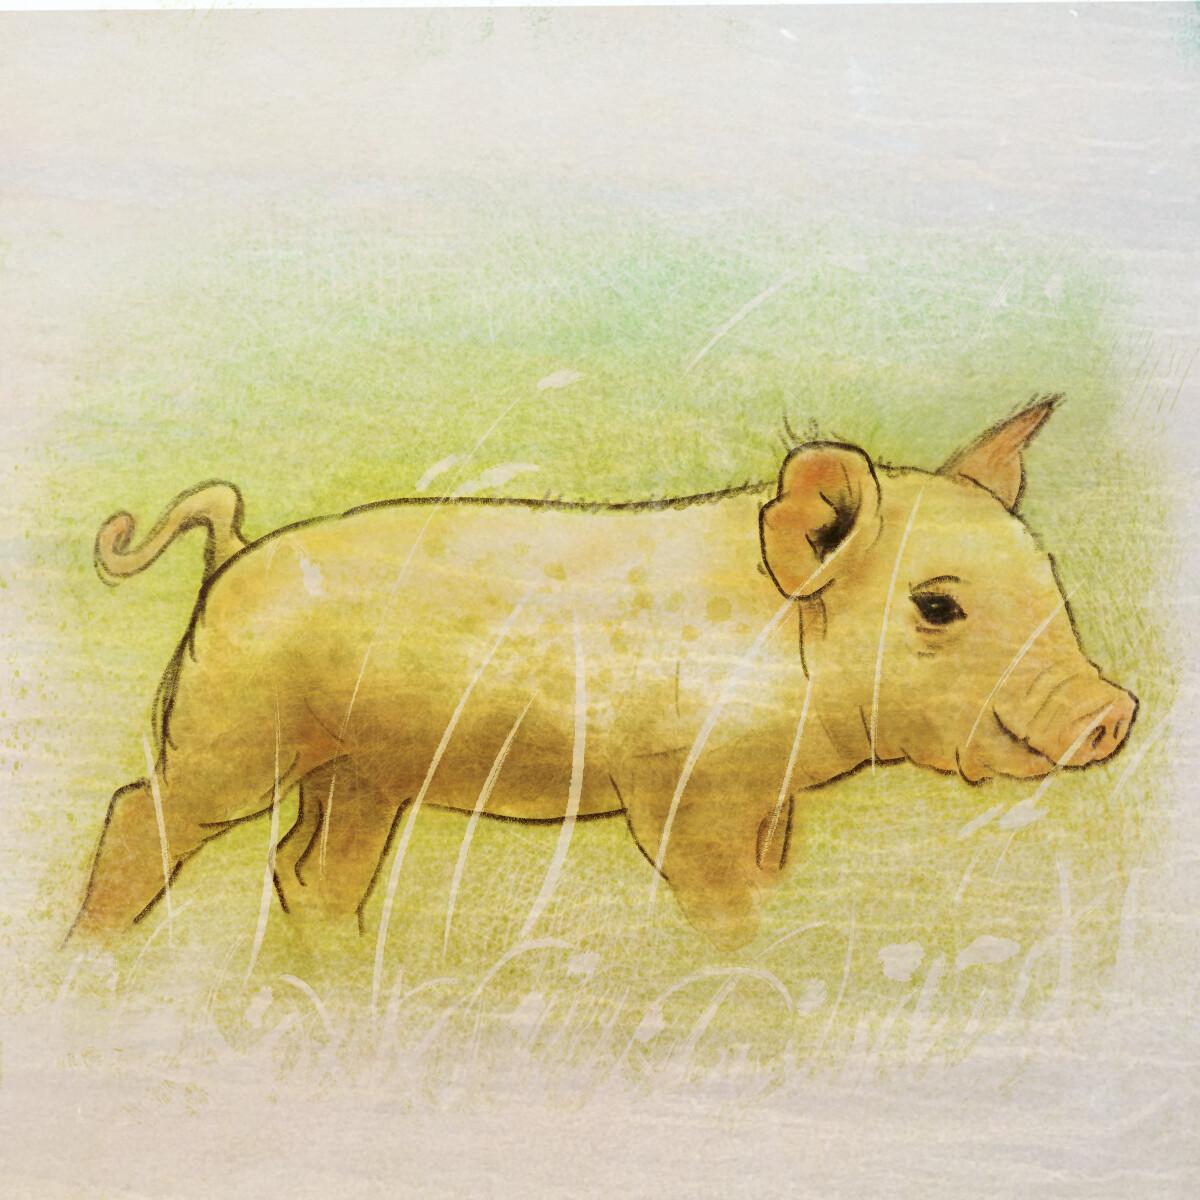 Piglet in Procreate